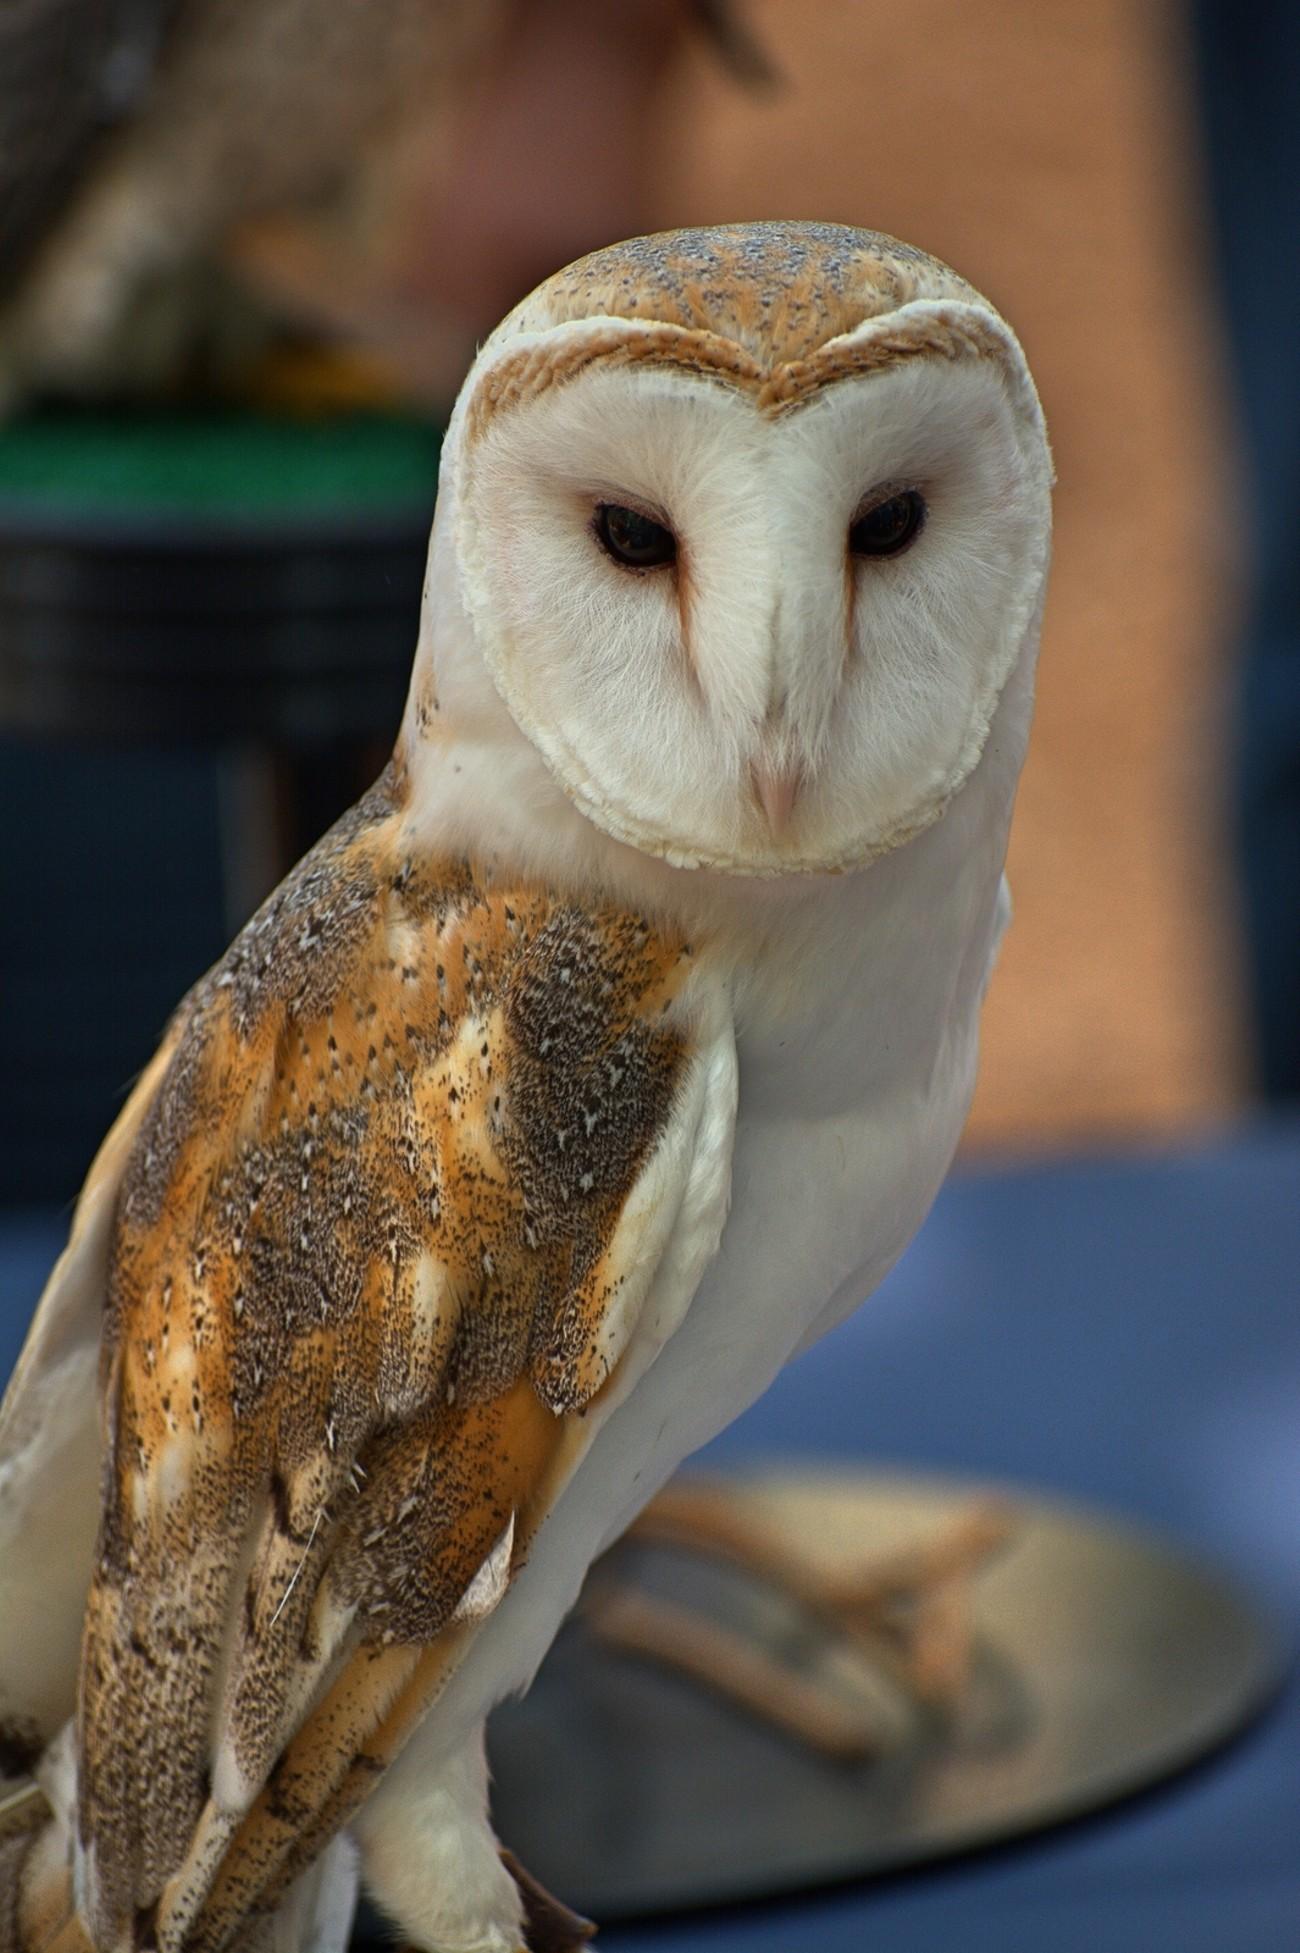 Finally got my Owl shot, Captive Barn Owl at Earth Day celebration